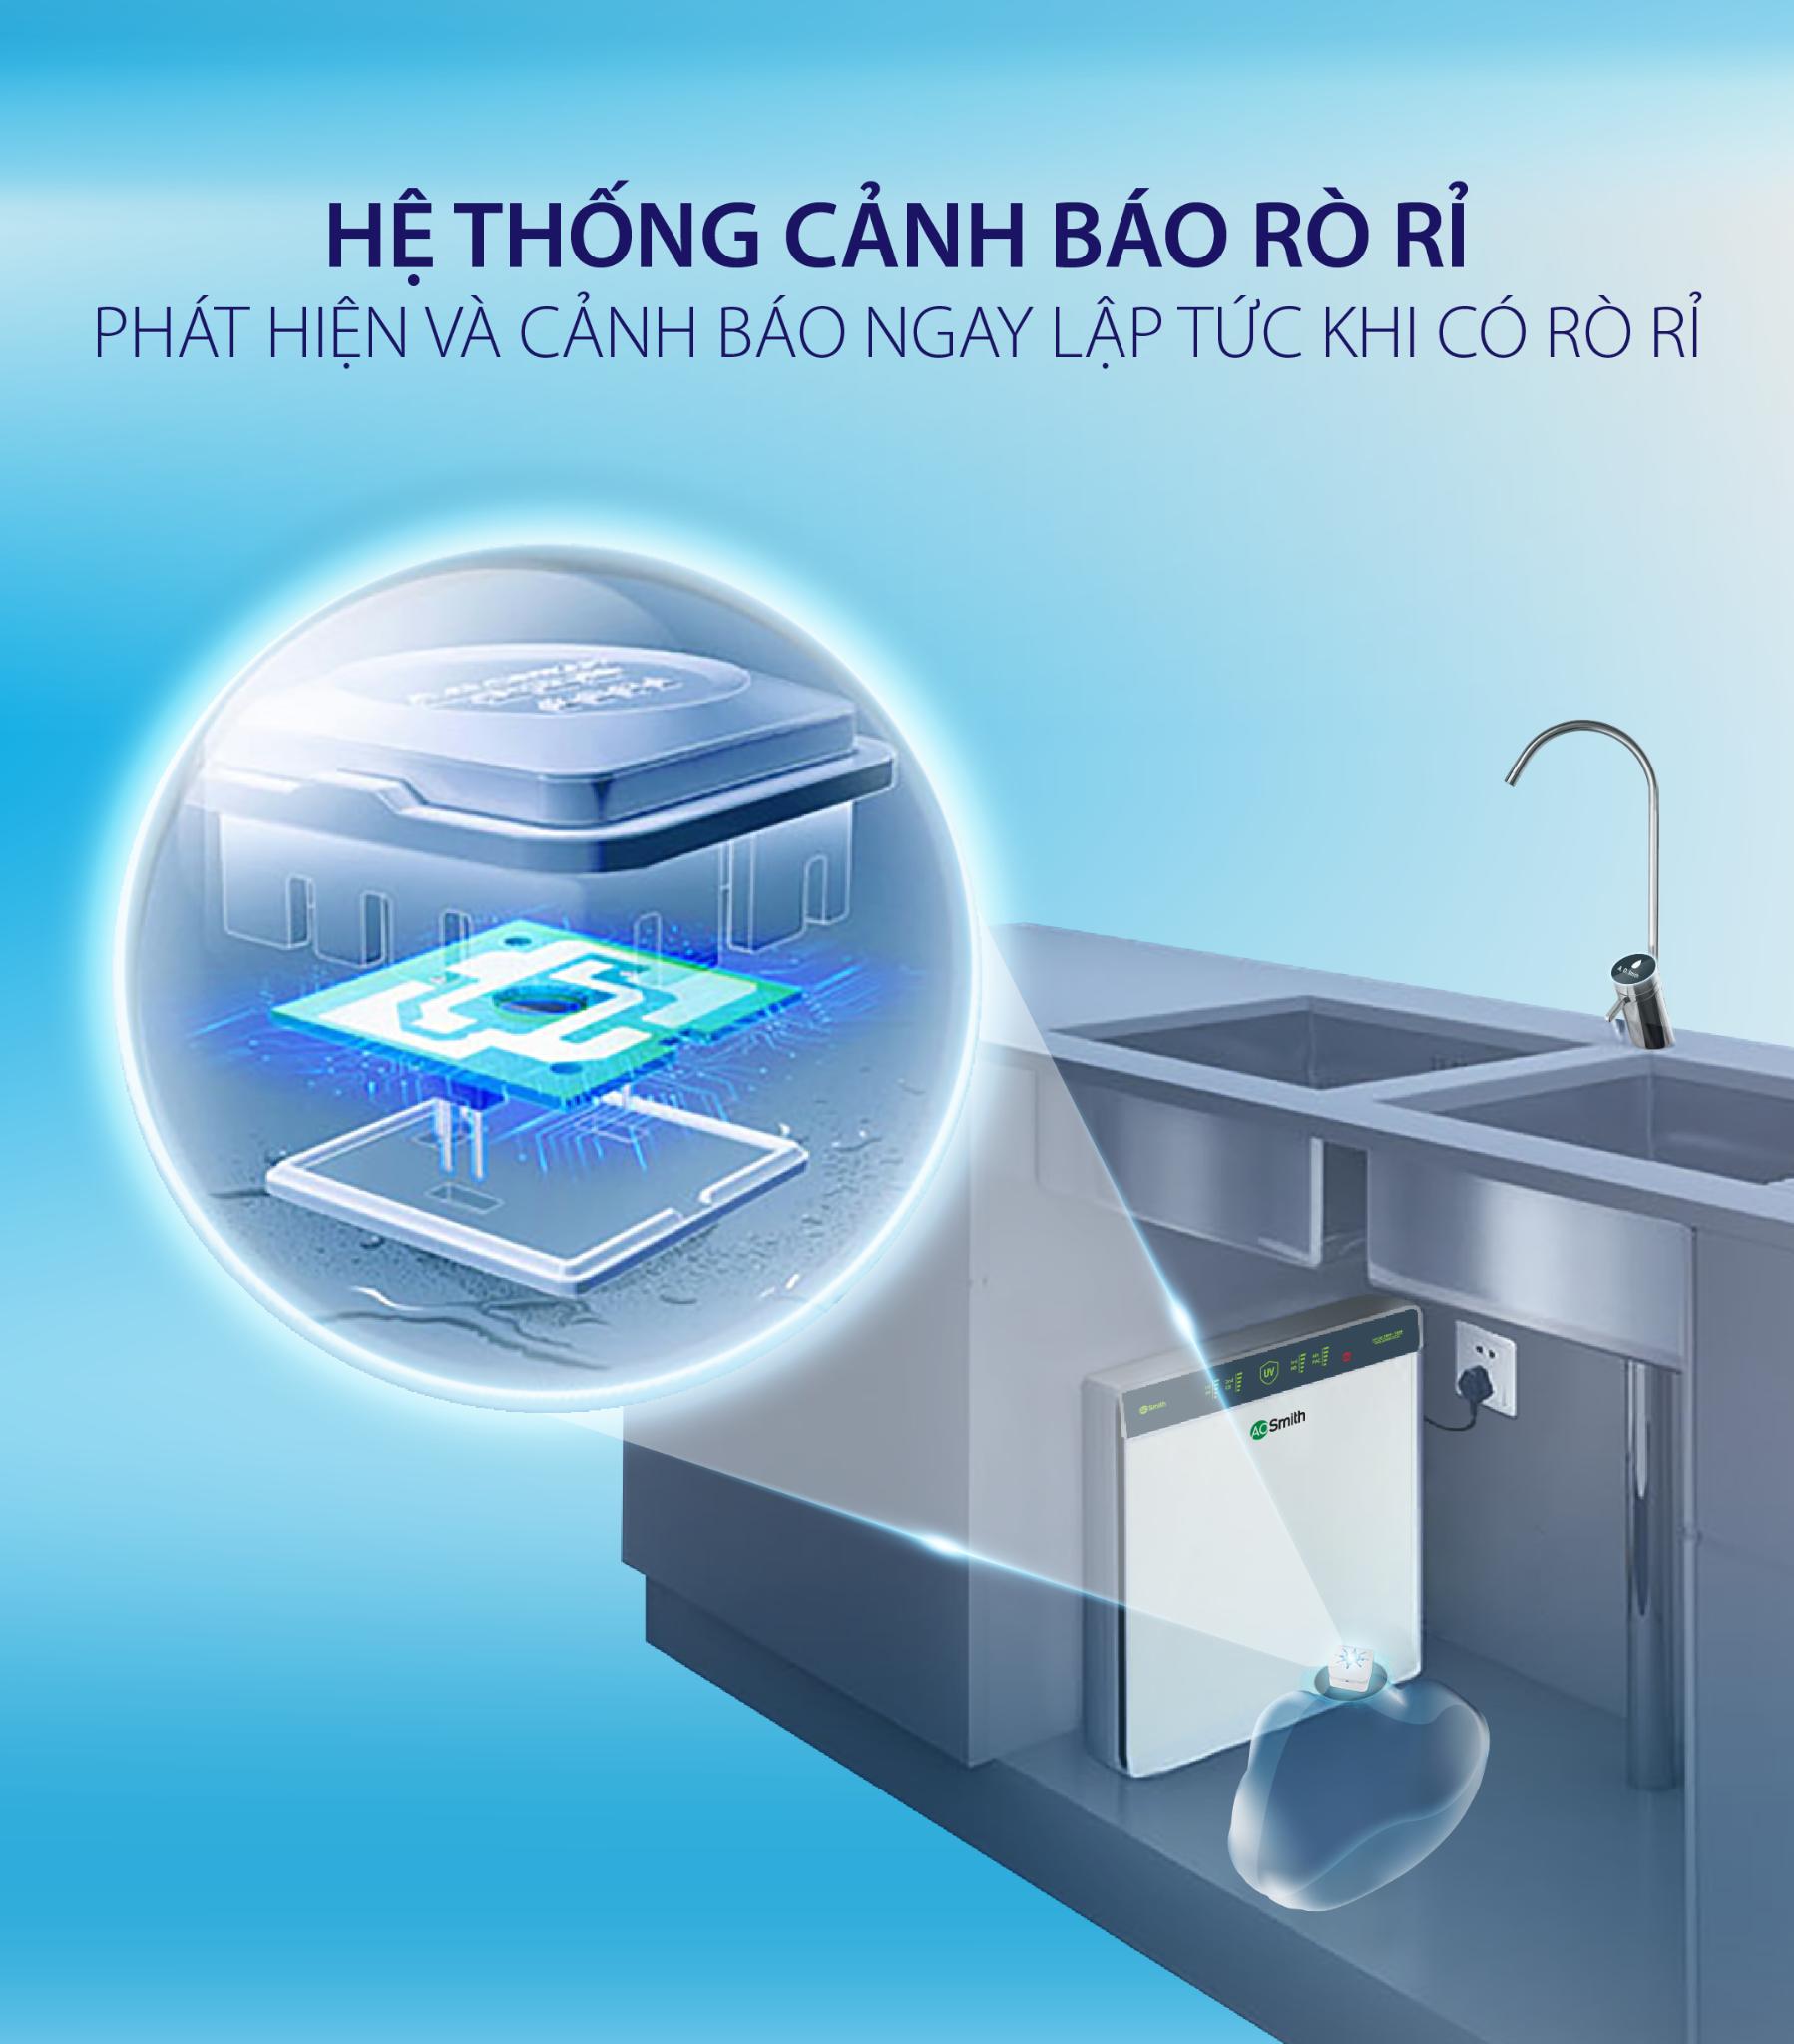 canh bao ro ri may loc nuoc aosmith ar75 u3 tại Đà Nẵng